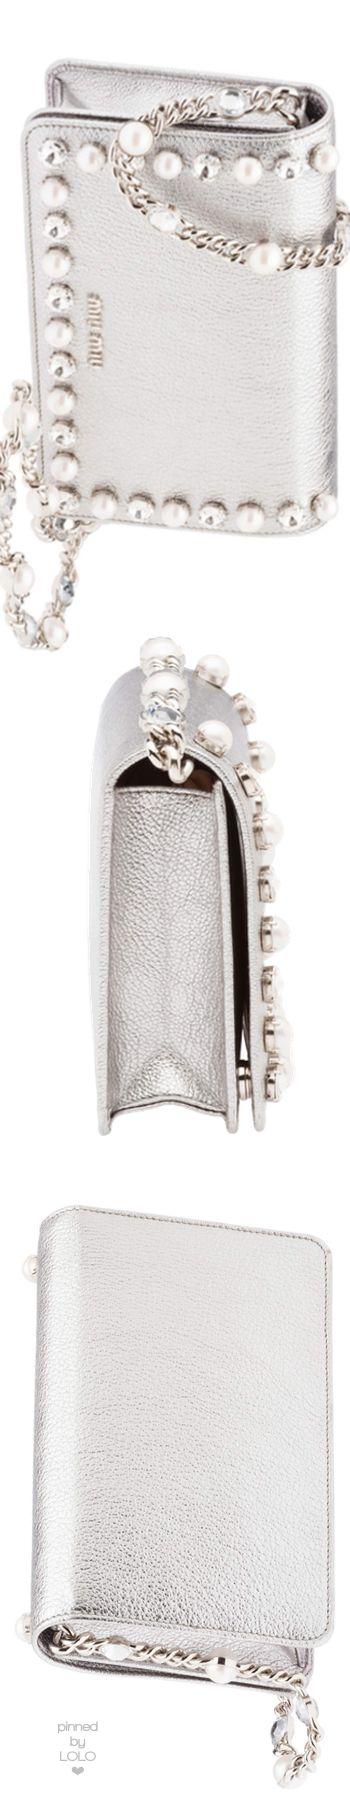 Miu Miu Silver Embellished bag